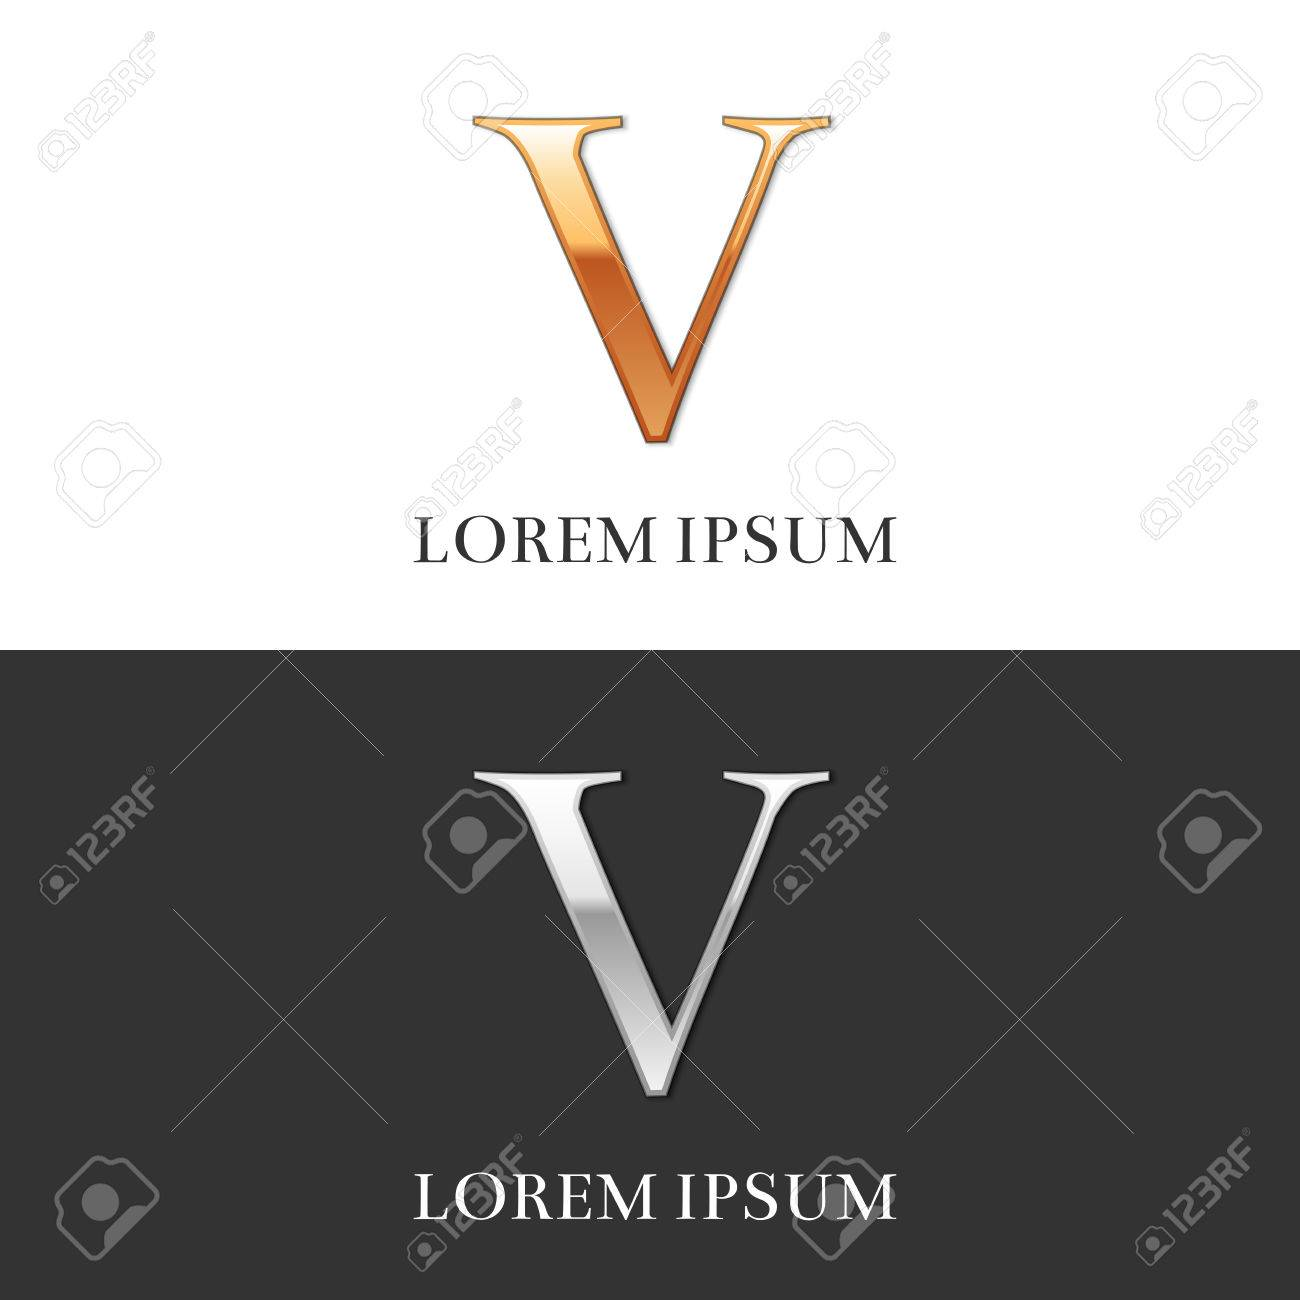 5 V Luxury Gold And Silver Roman Numerals Sign Symbol Icon